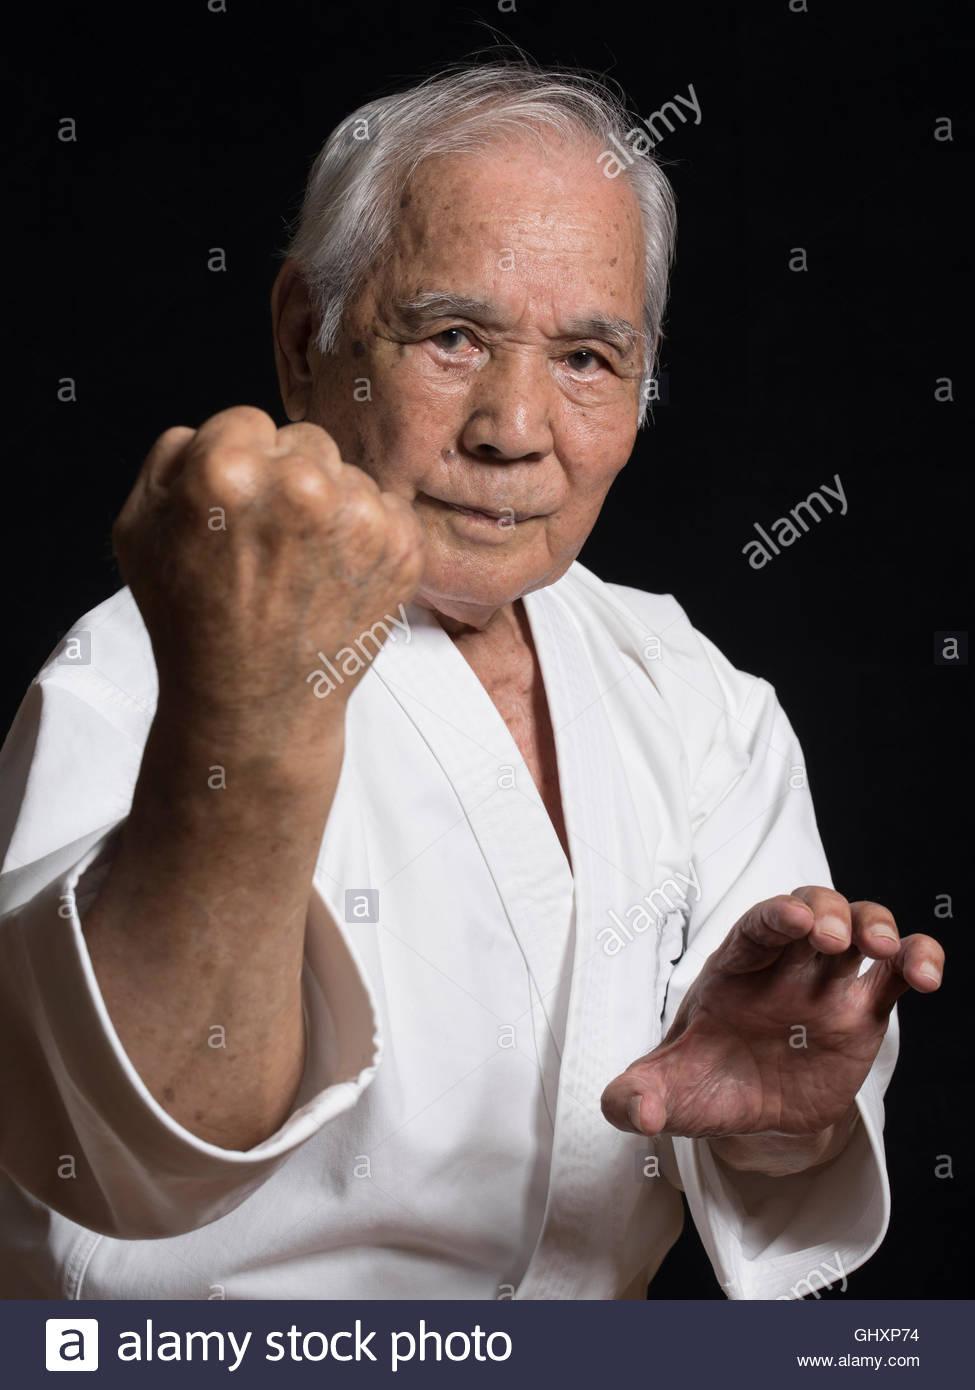 86 anni di Karate Master Shintoku Takara decimo dan Okinawa Uechi-ryu Karatedo Kyokai (D.0.B. 10/05/1930). La longevità Immagini Stock